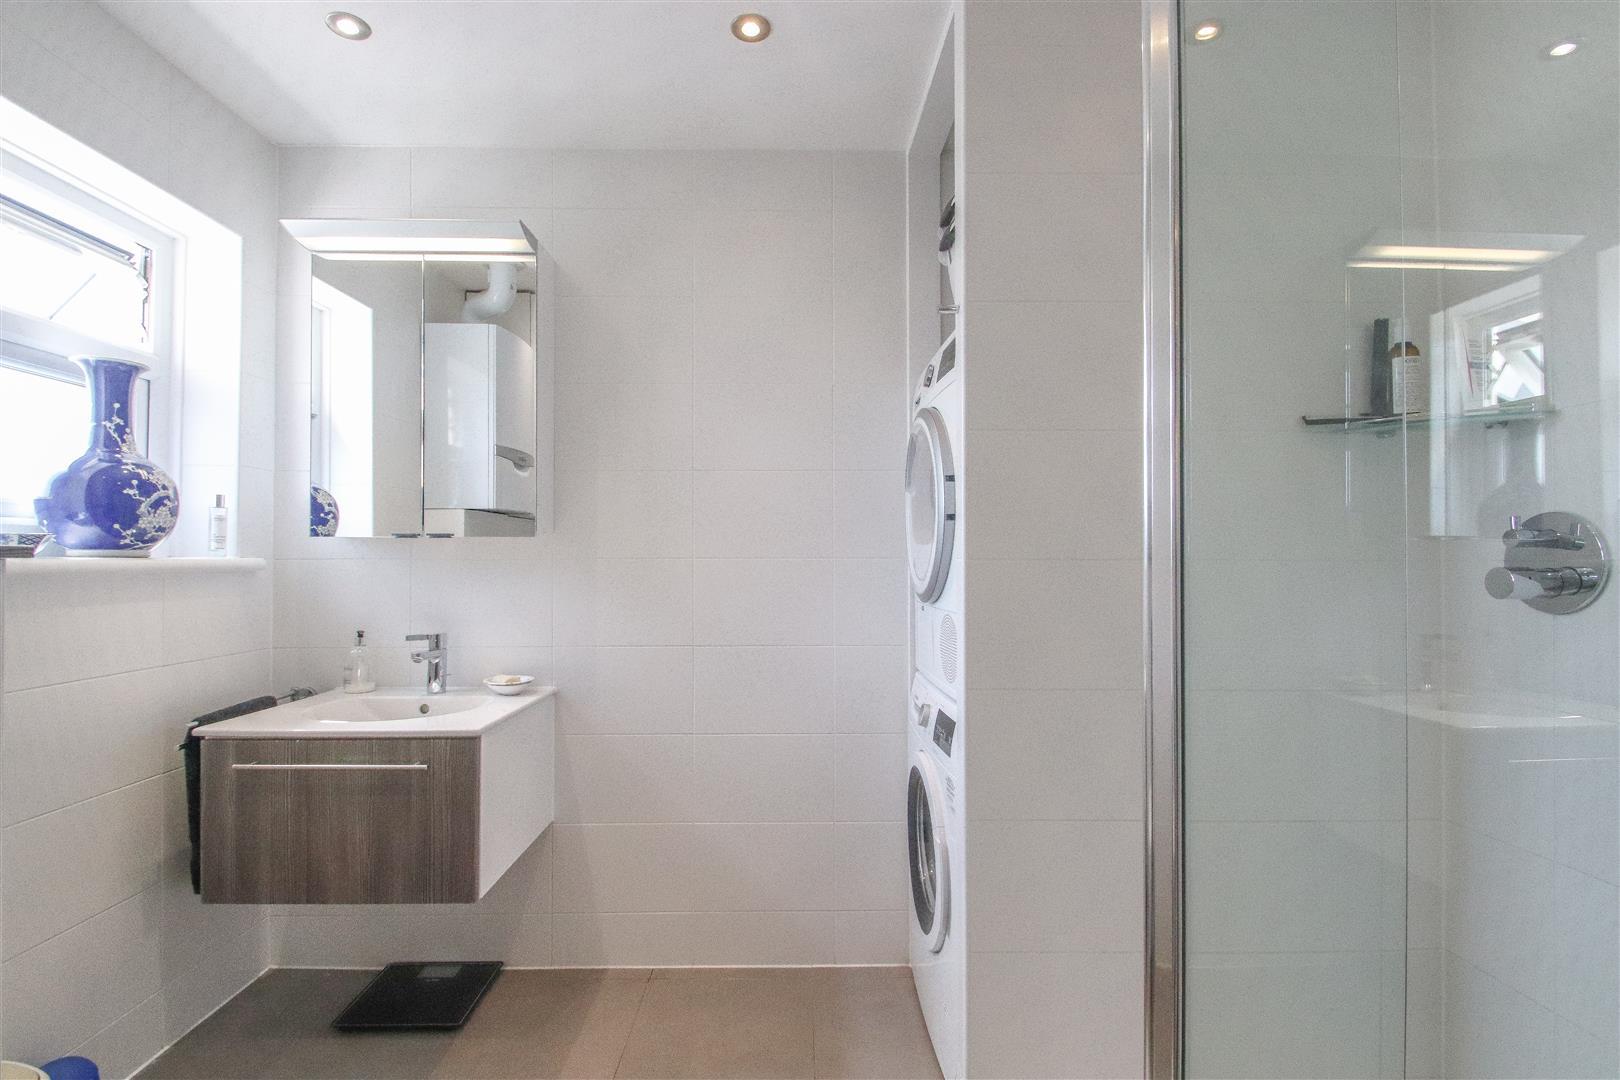 Shower - Utility